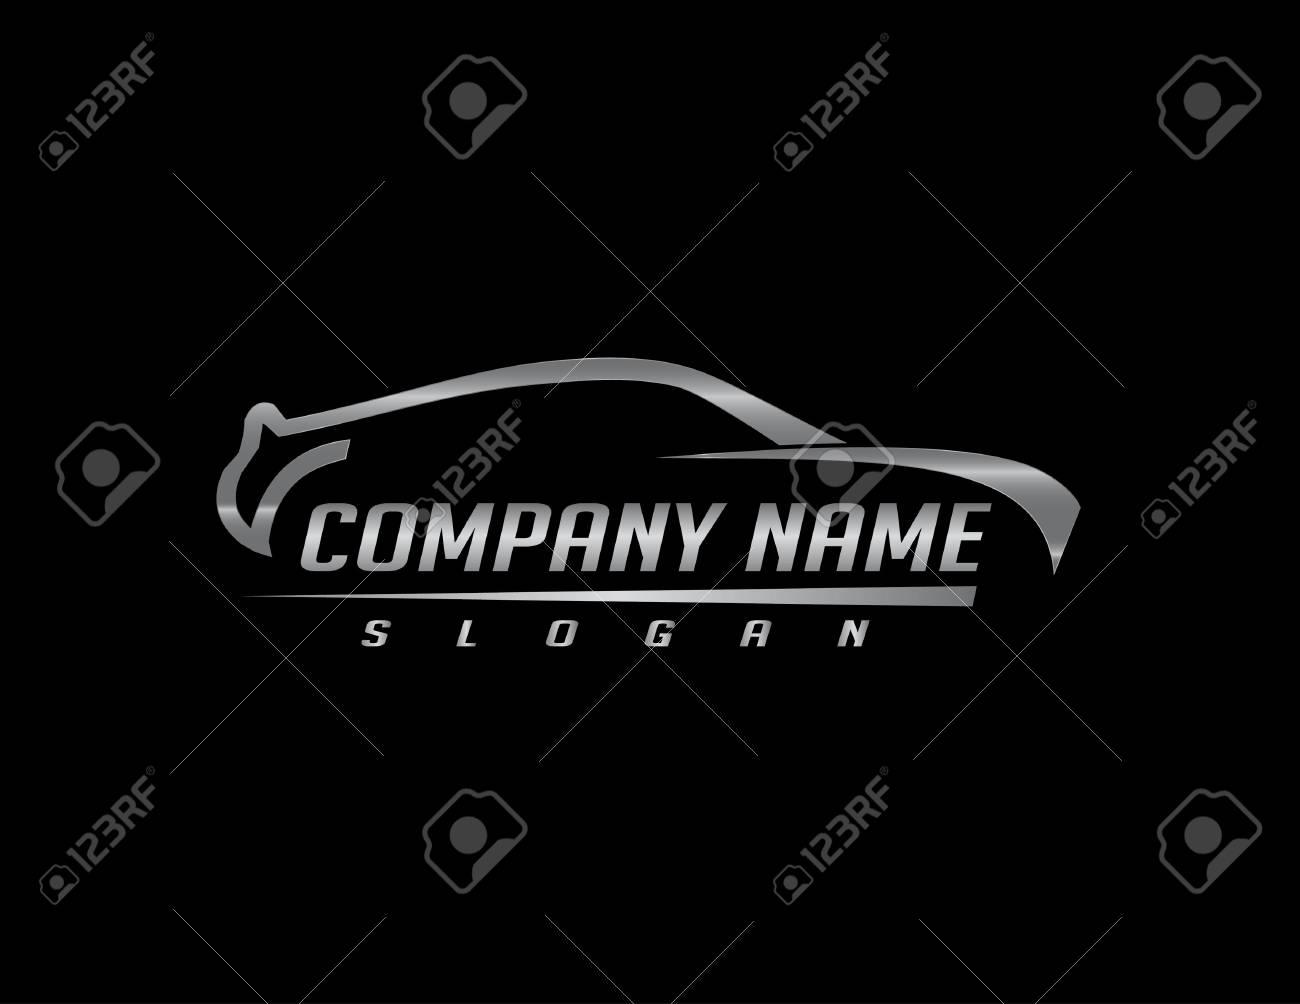 Car logo 2 black background - 80306235